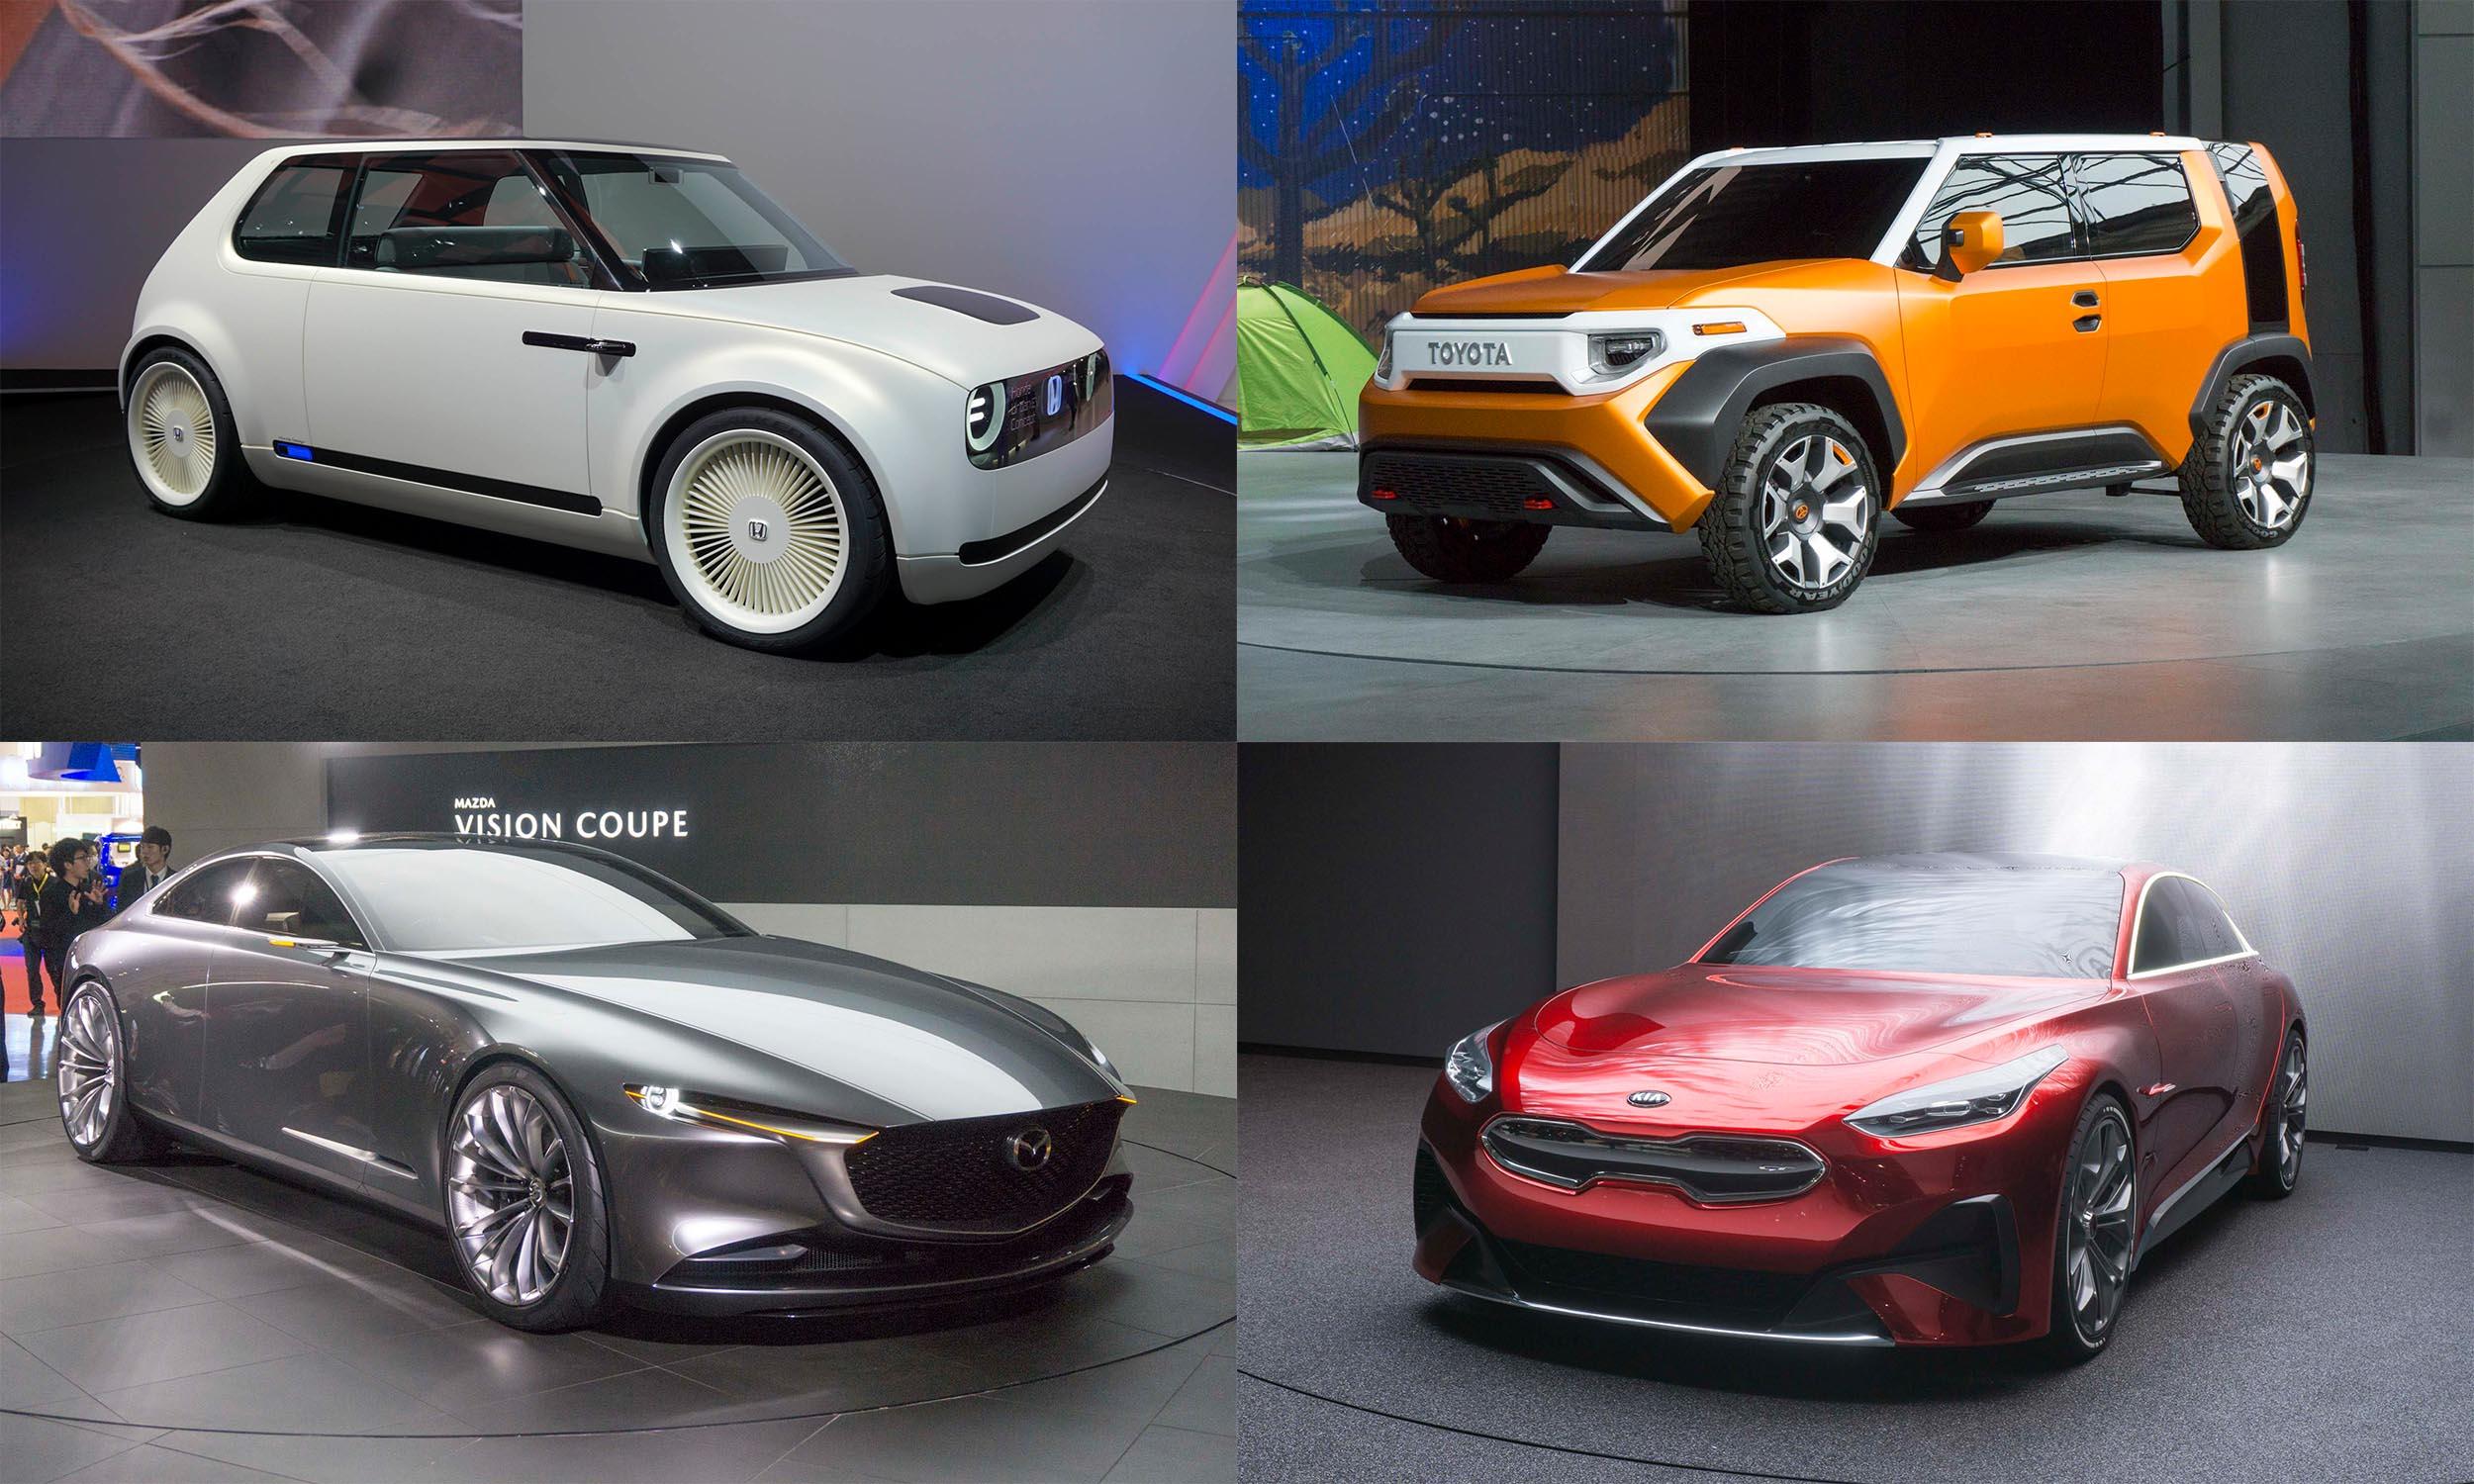 Top Concept Cars Of 2017 Autonxt The Electric Car Chevrolet Fnr